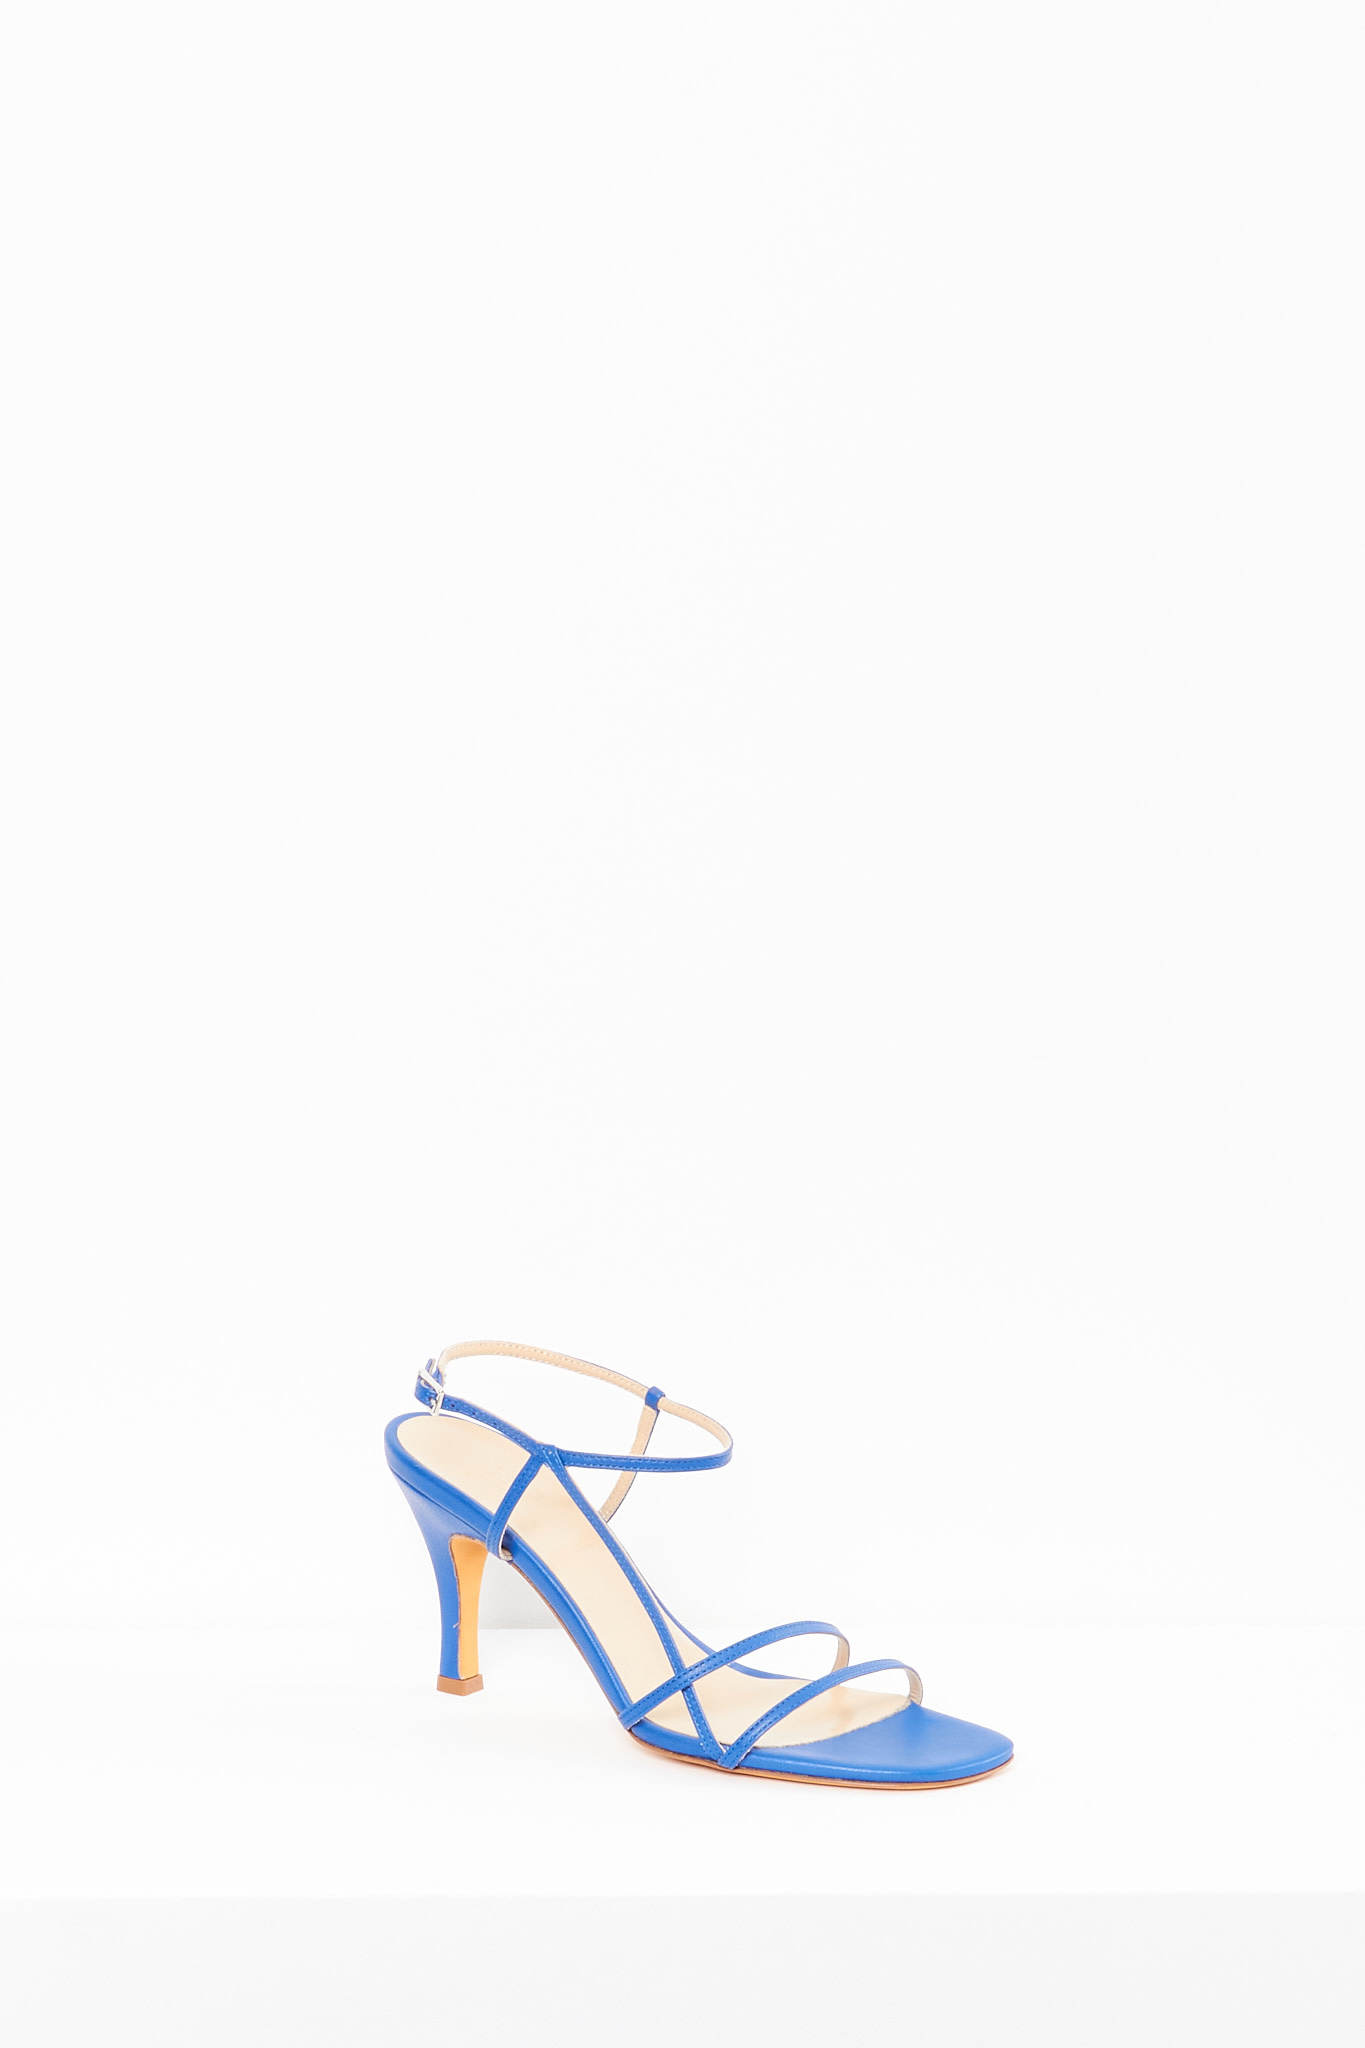 Maryam Nassir Zadeh Irene sandals